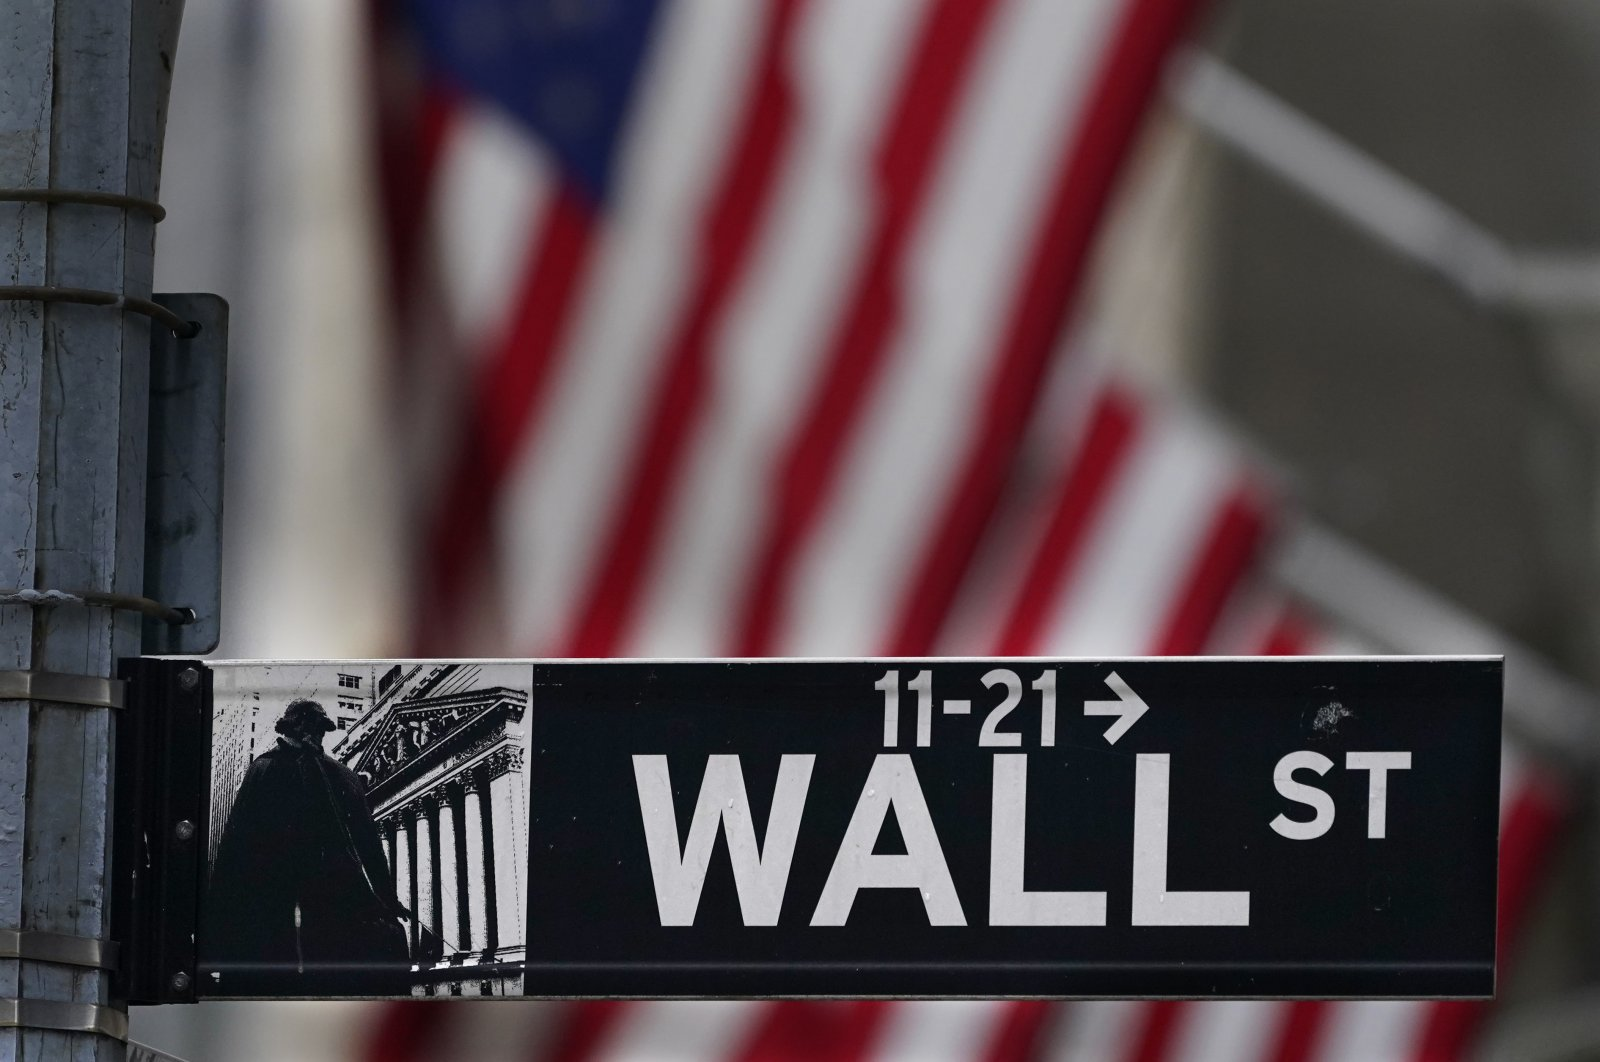 A street sign is displayed at the New York Stock Exchange in New York, N.Y., U.S., Nov. 23, 2020. (AP Photo)